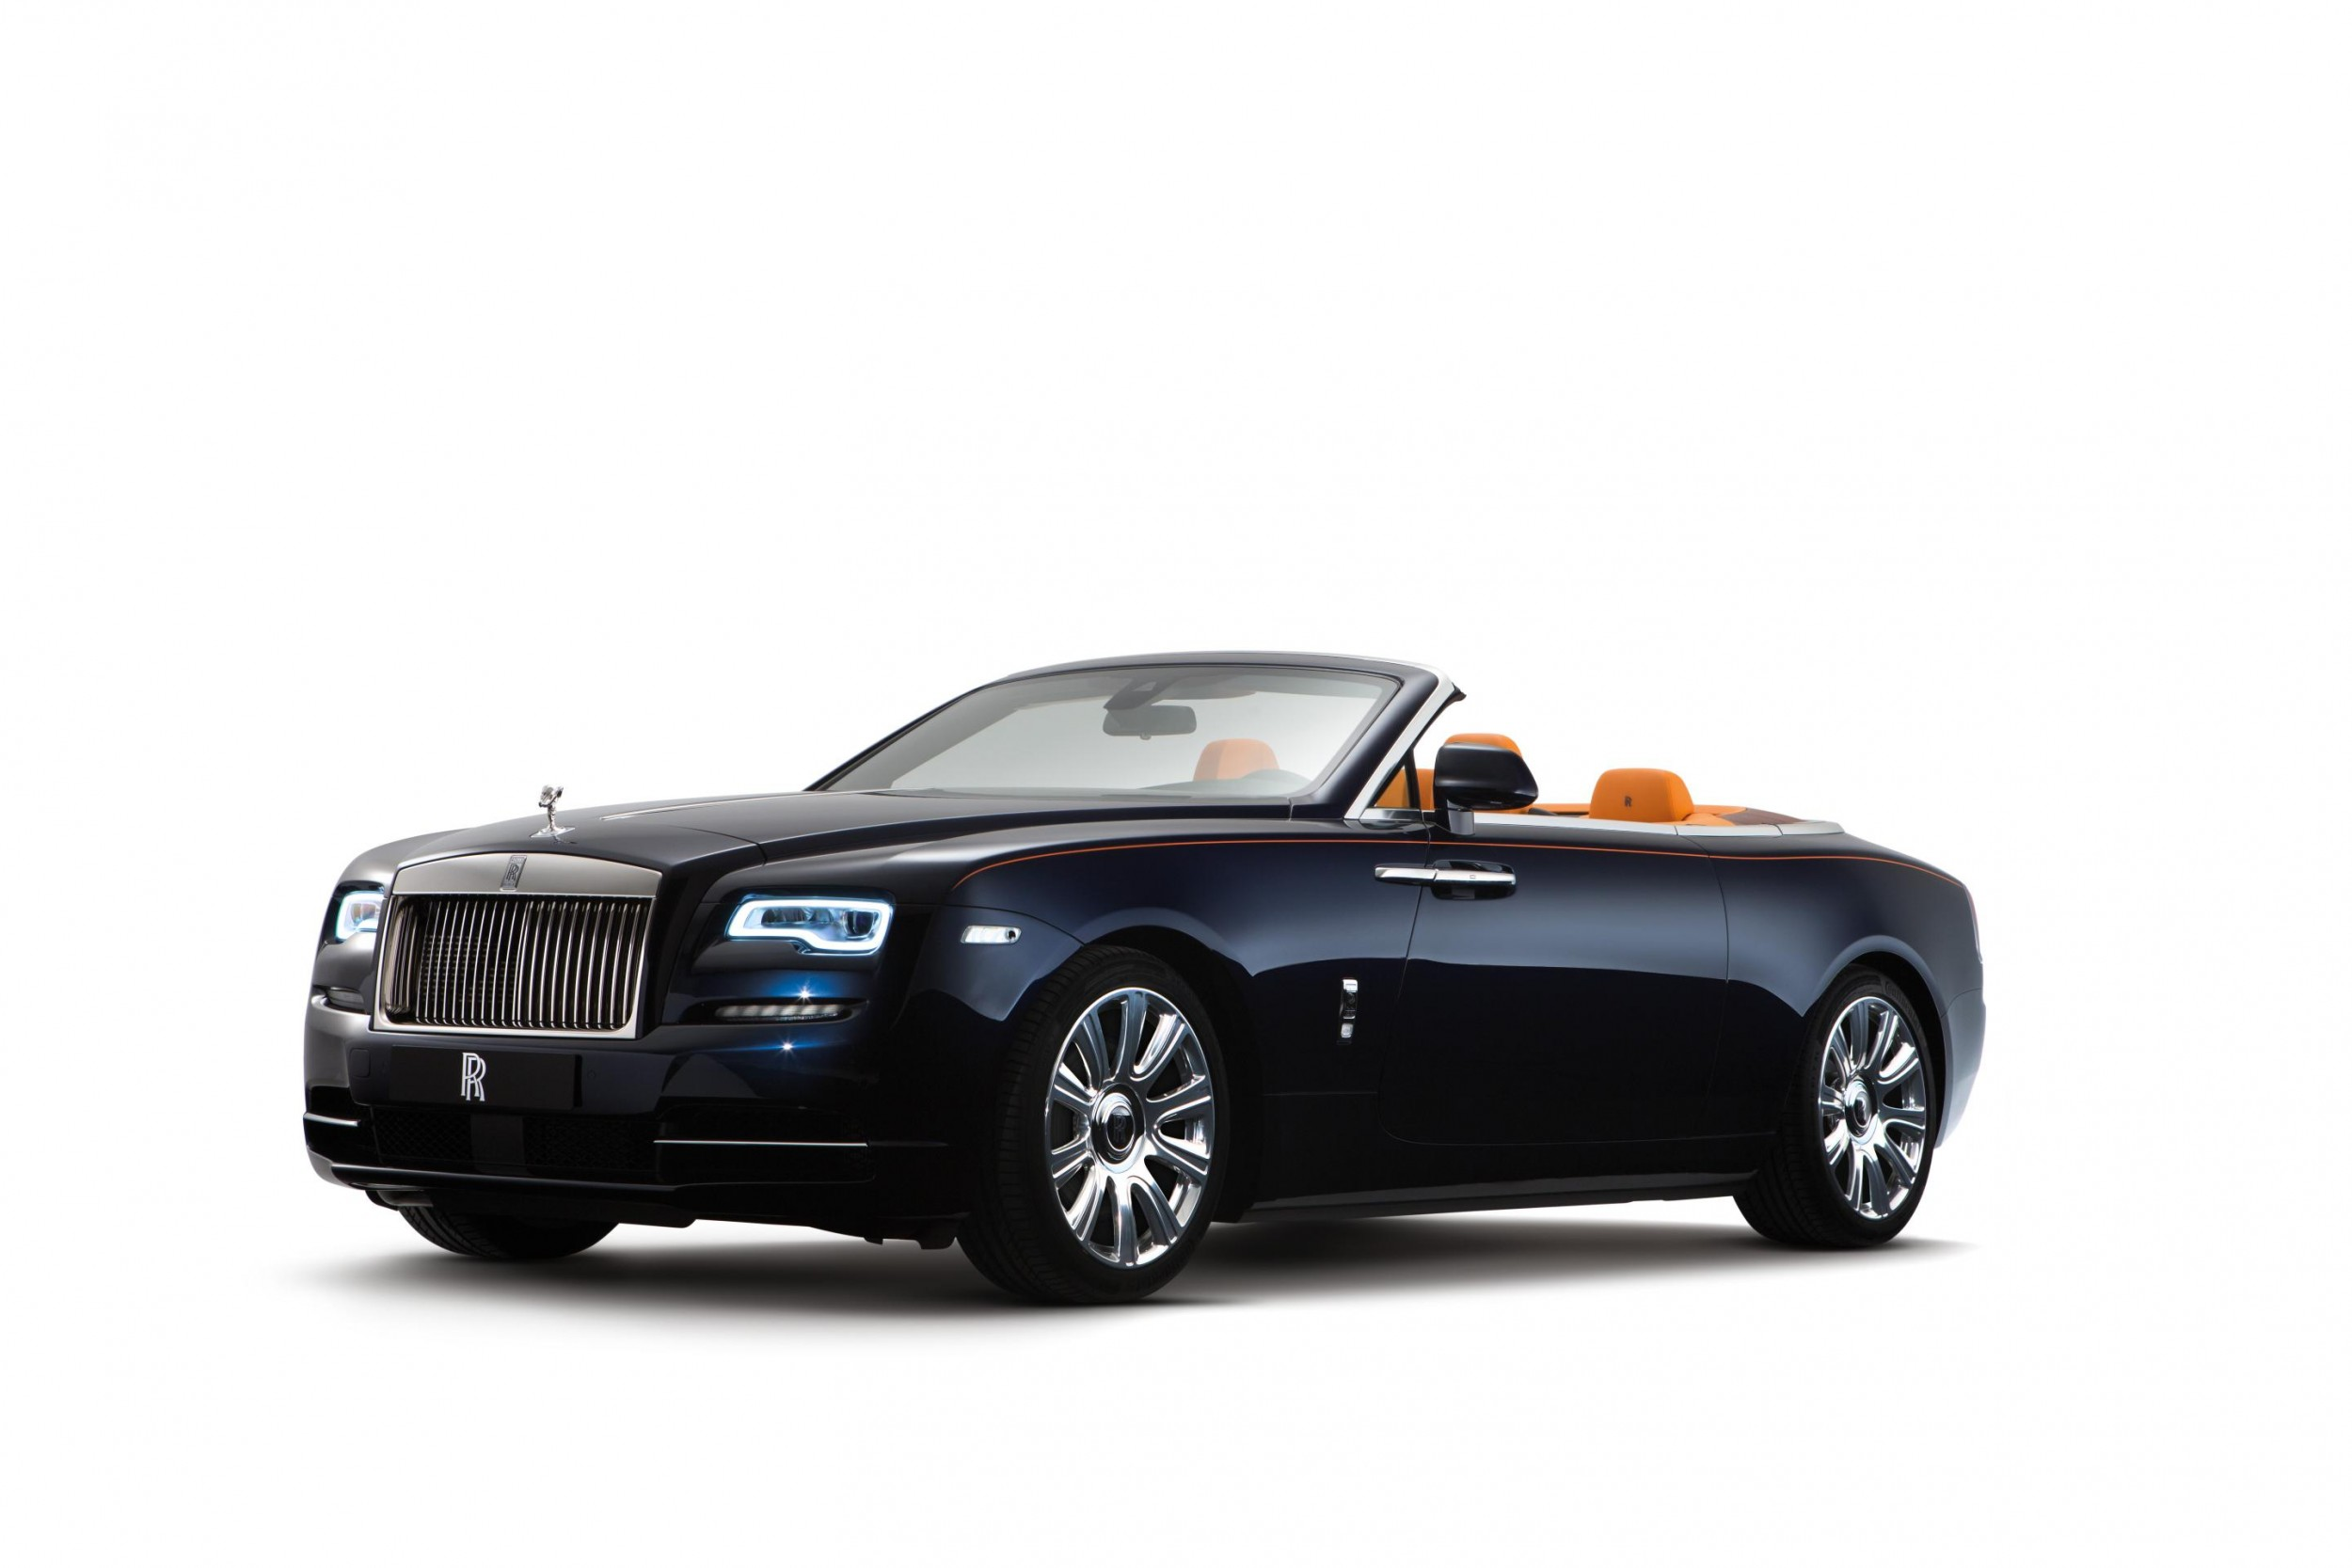 Rolls Royce Reveals New Convertible Model 2016 Rolls Royce Dawn